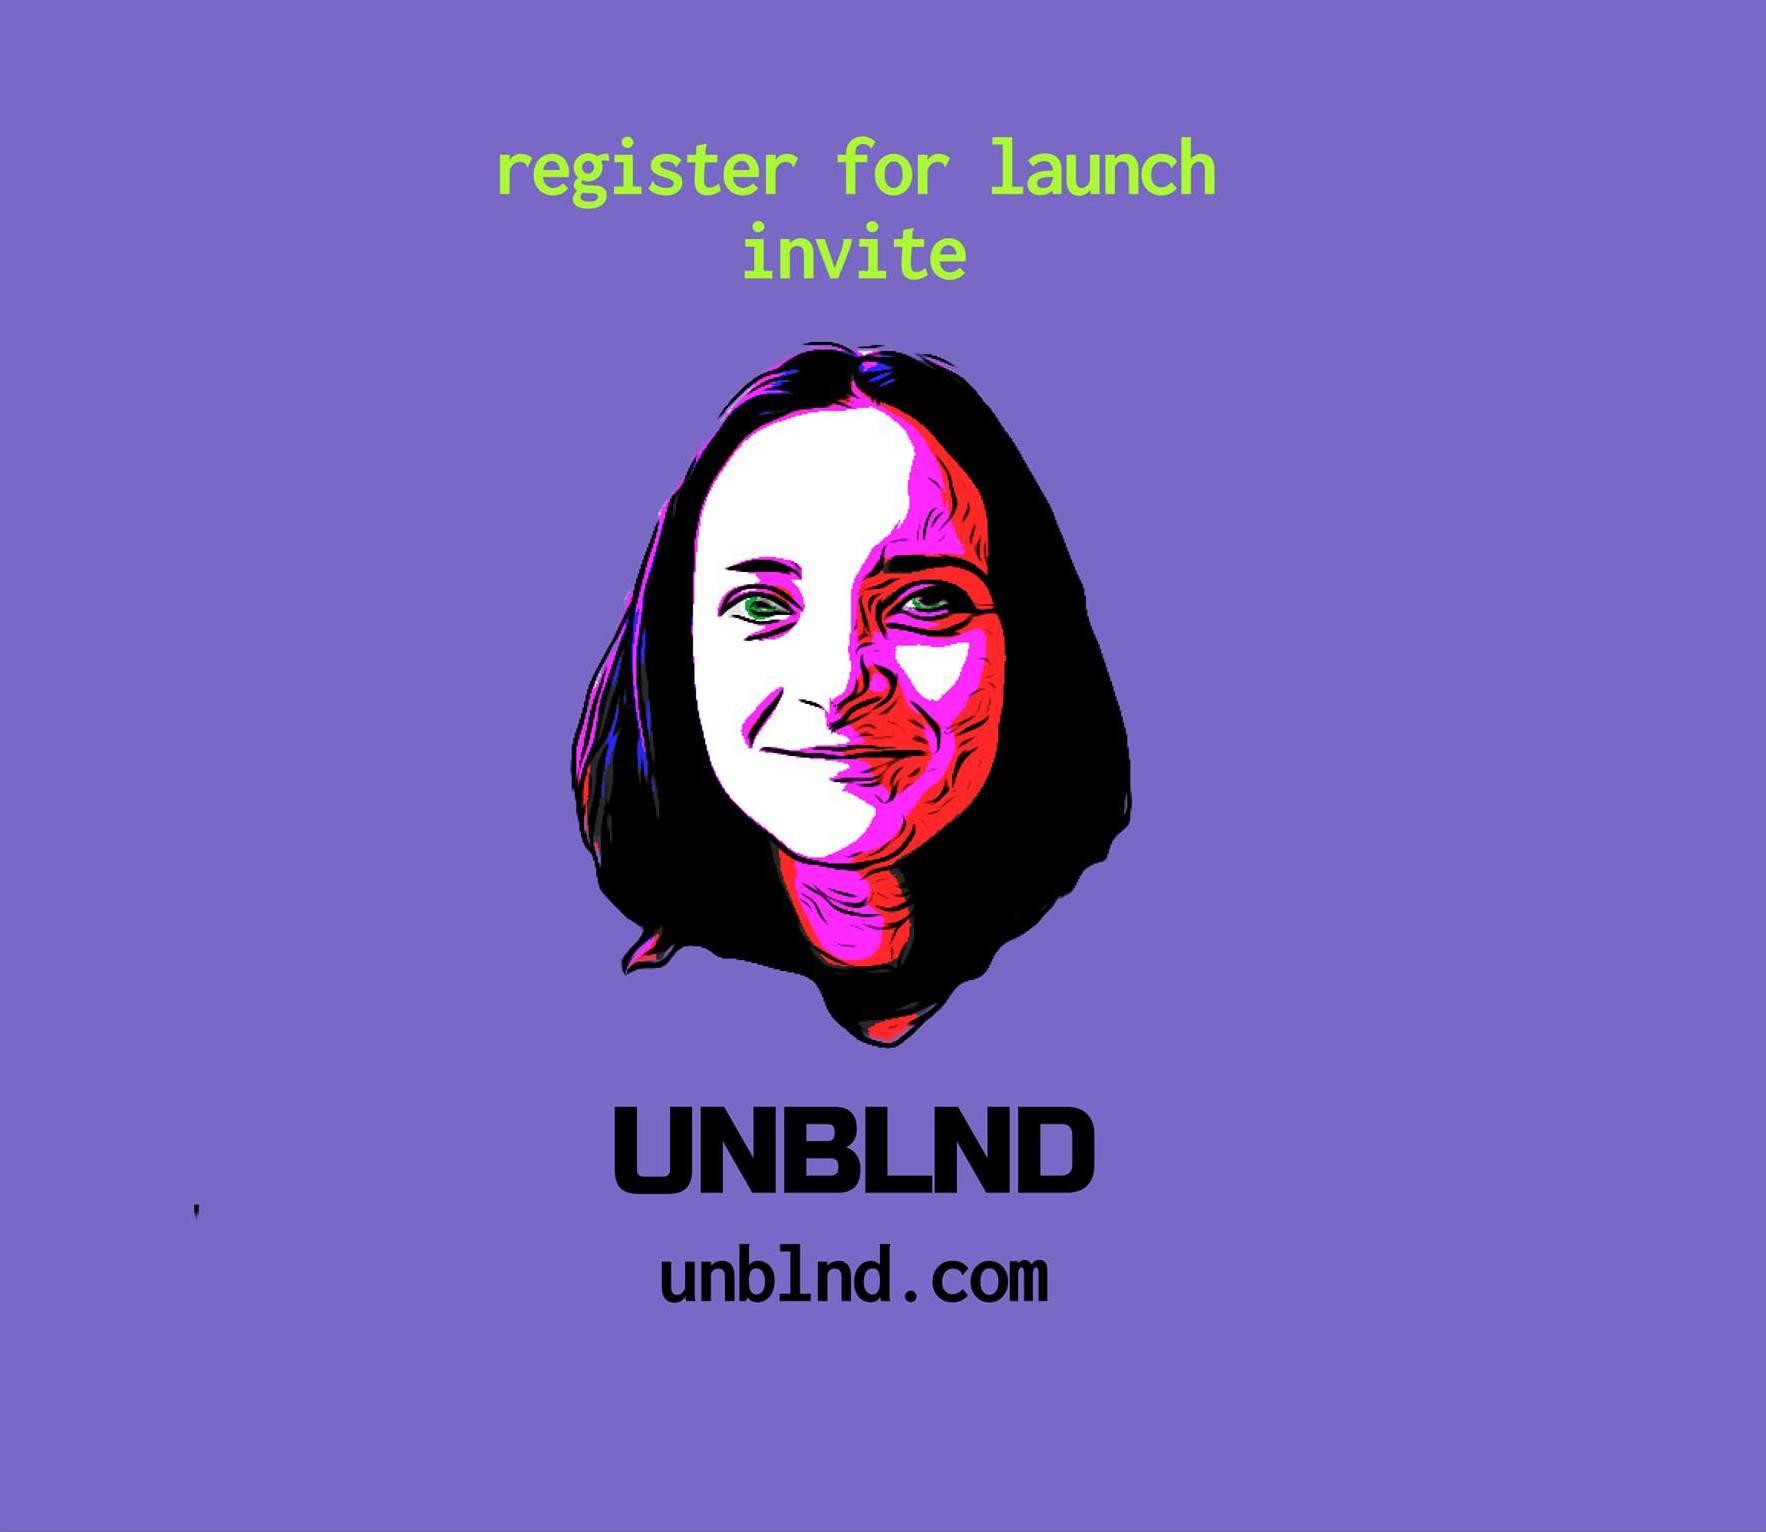 Ambassador Dariia - Make new friends | UNBLND